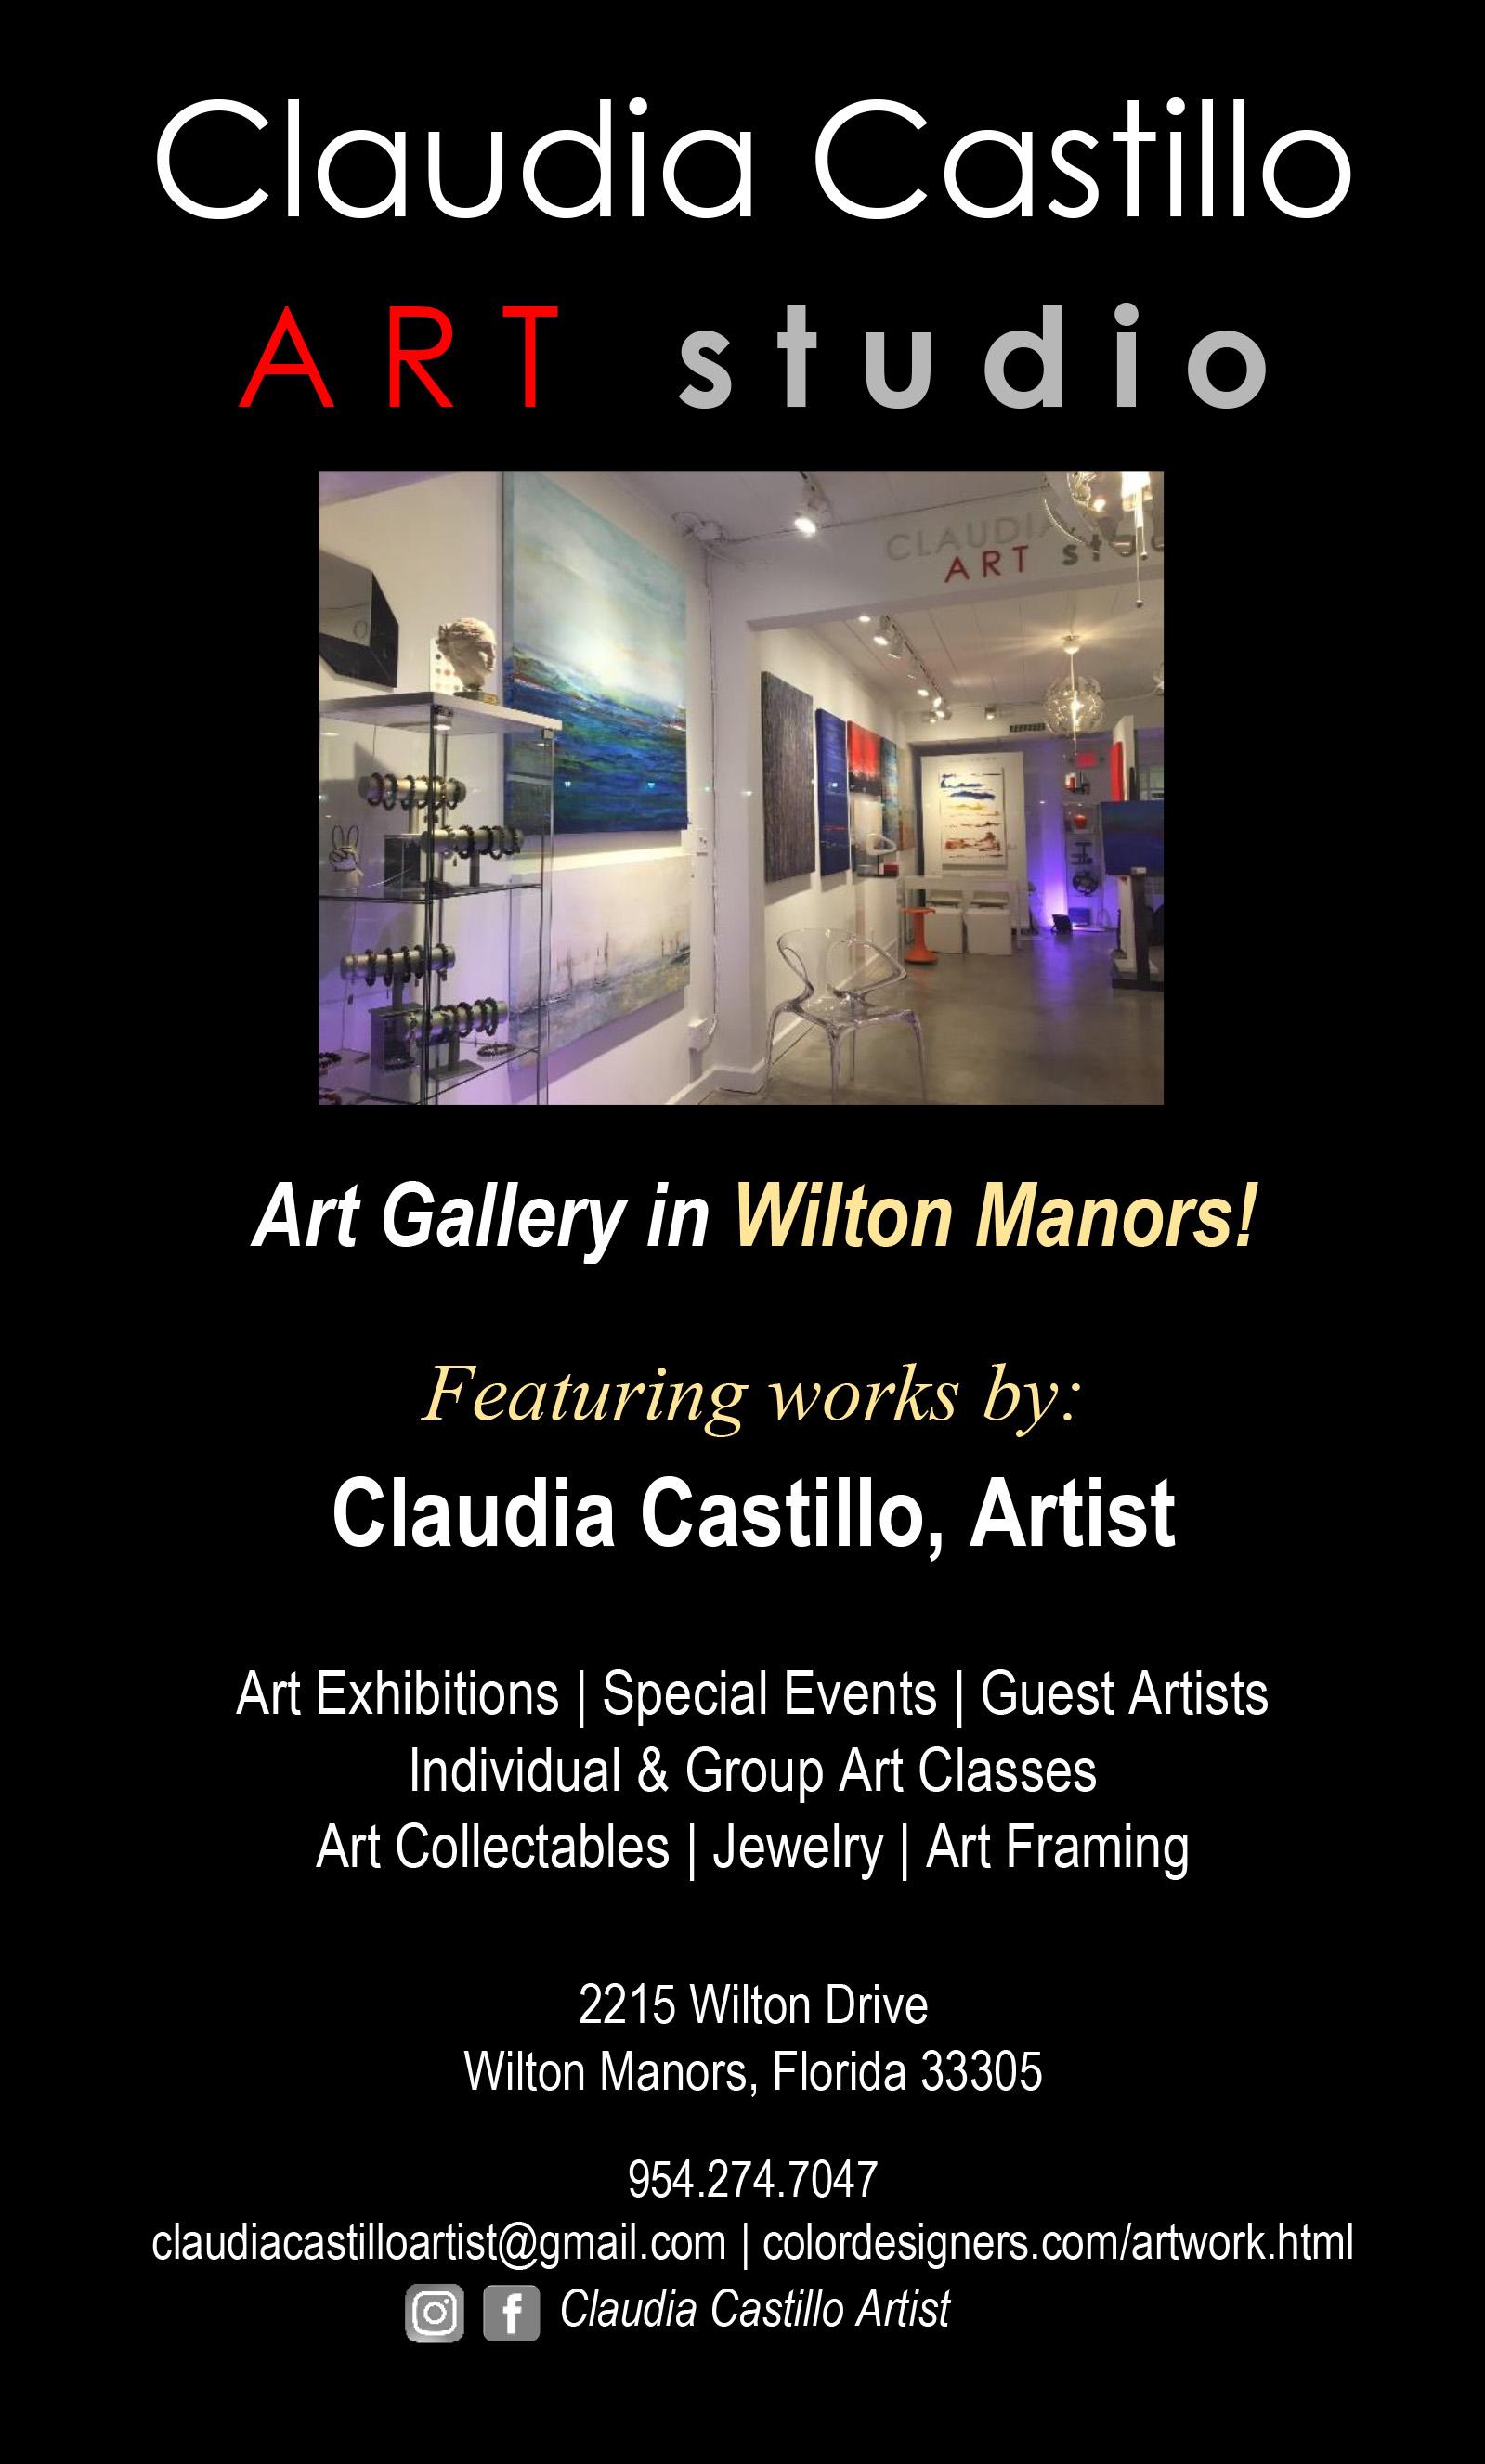 . TRANSFORMATION Presented by Claudia Castillo ART studio presented by